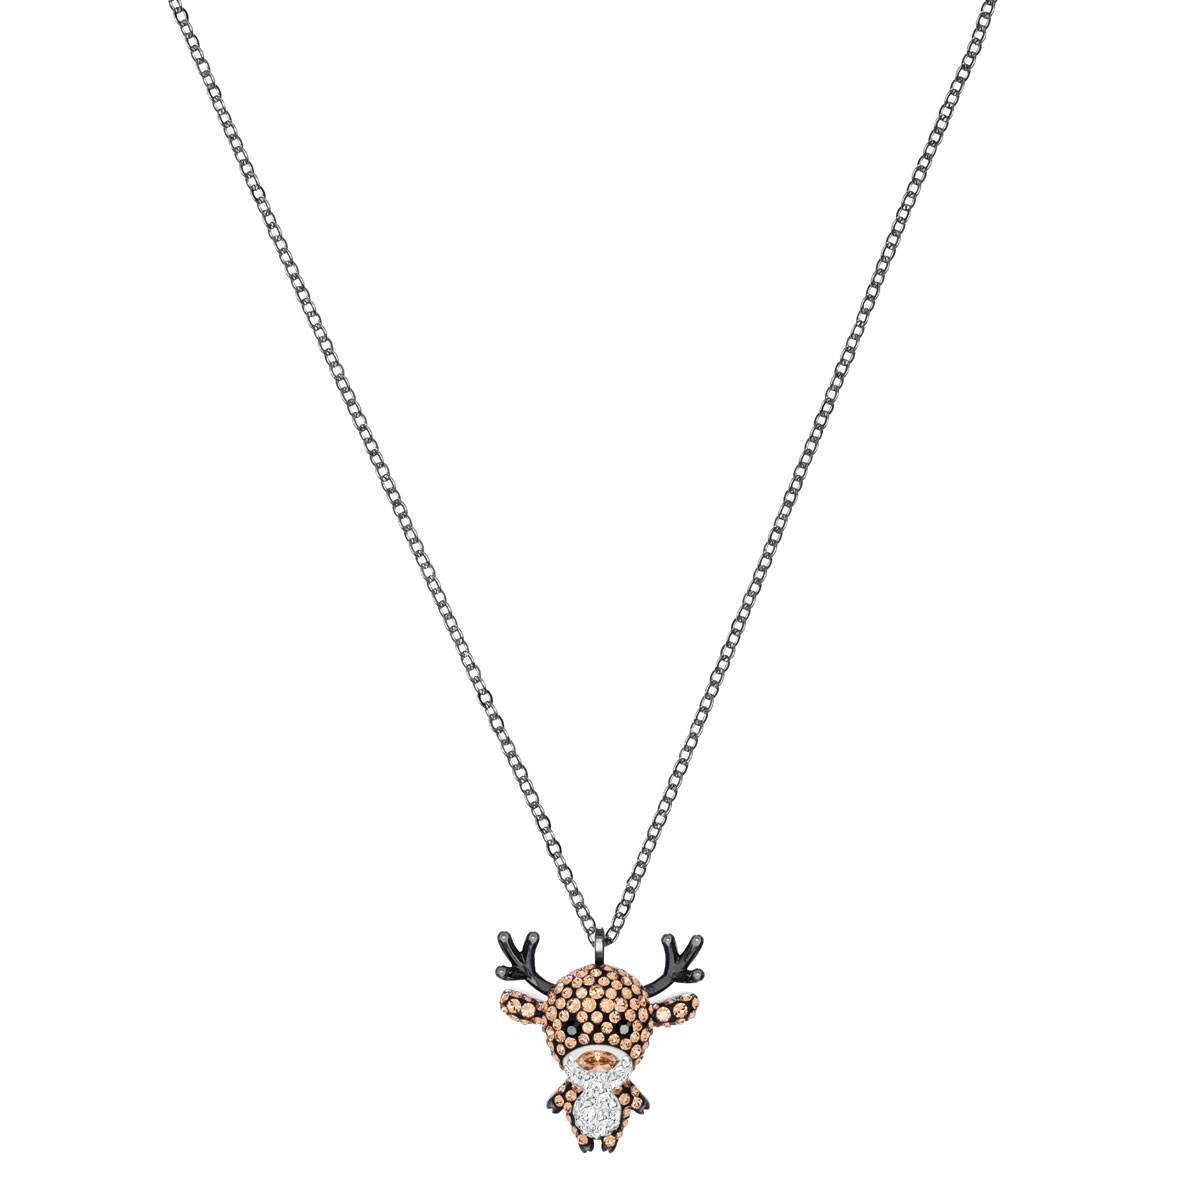 Swarovski Little Reindeer Multi Colored Pendant Necklace